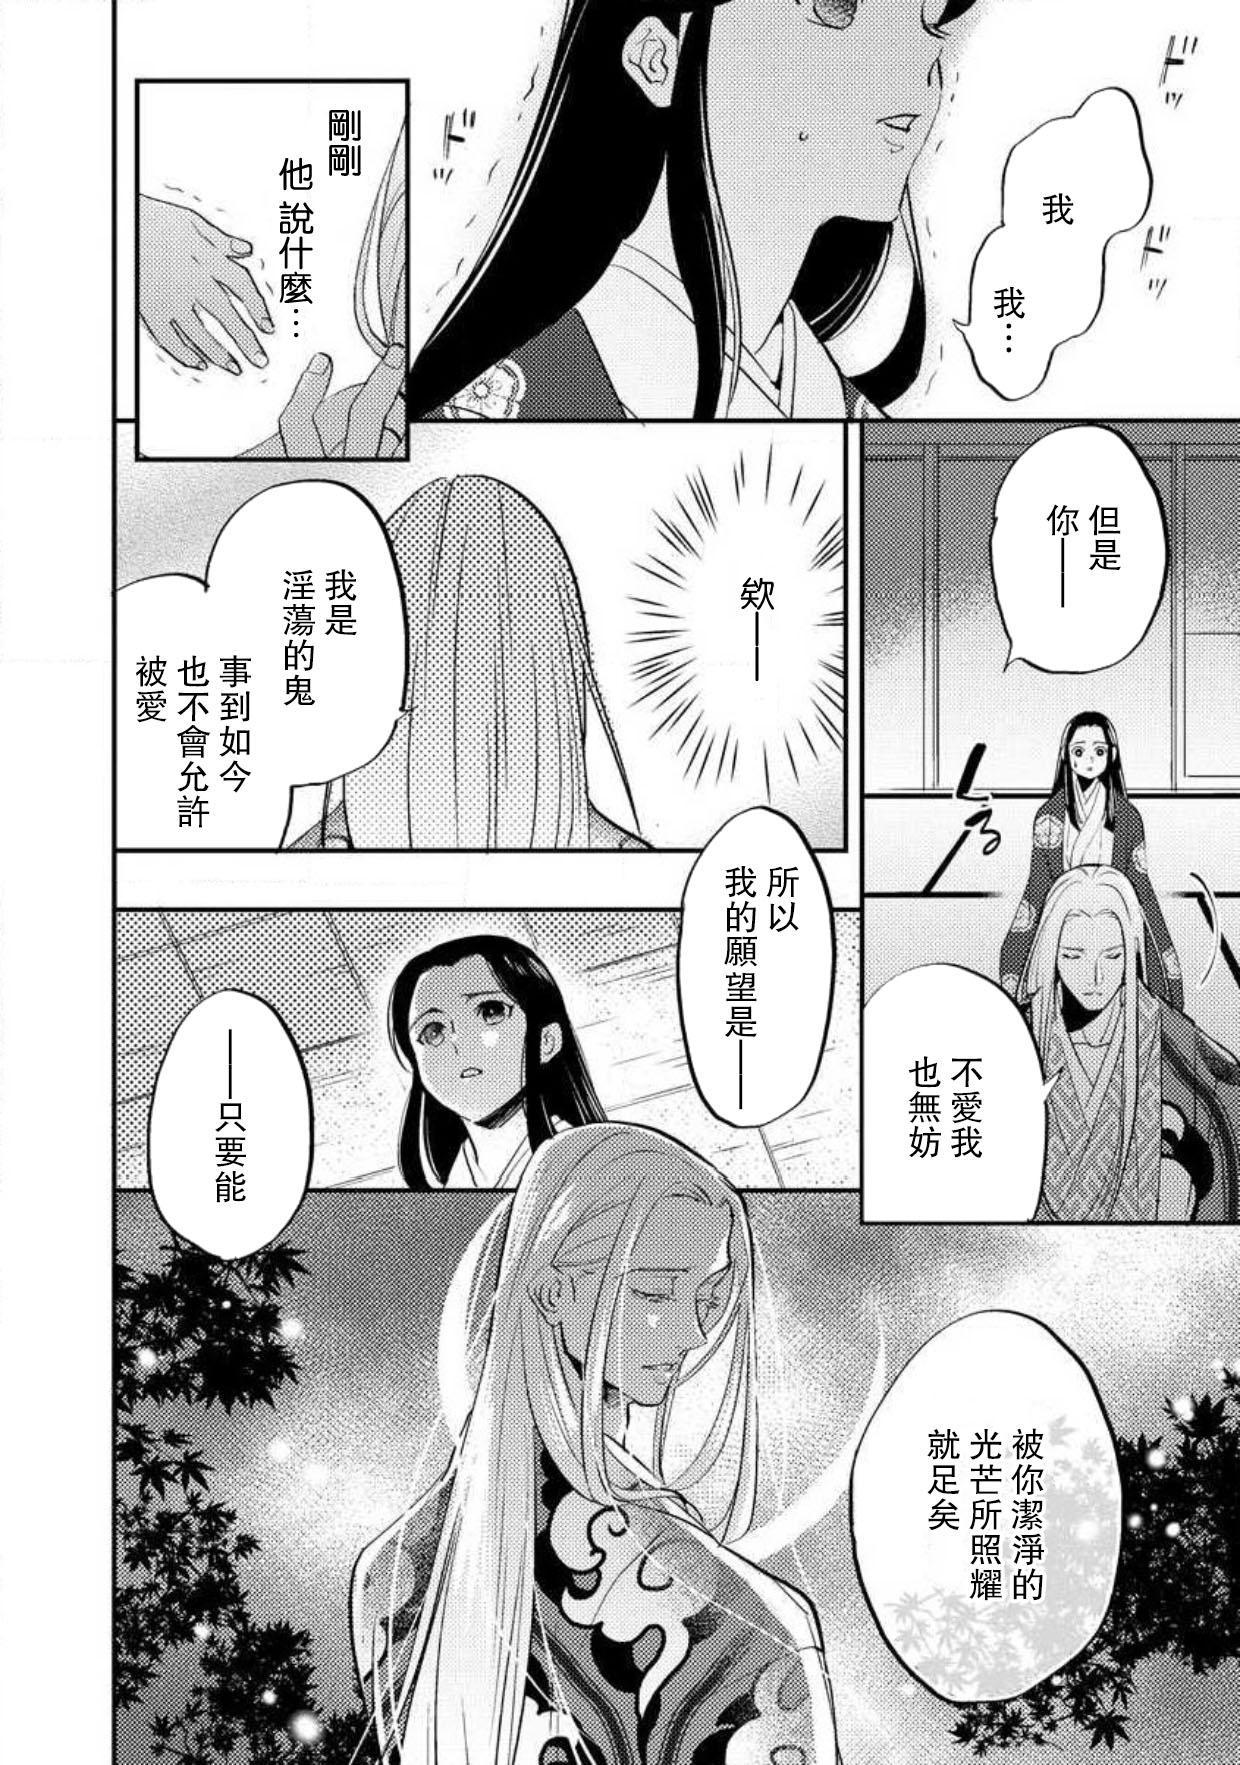 Oeyama suimutan utsukushiki oni no toraware hime | 大江山醉夢逸話 美麗的鬼與被囚禁的公主 Ch. 1-8 173